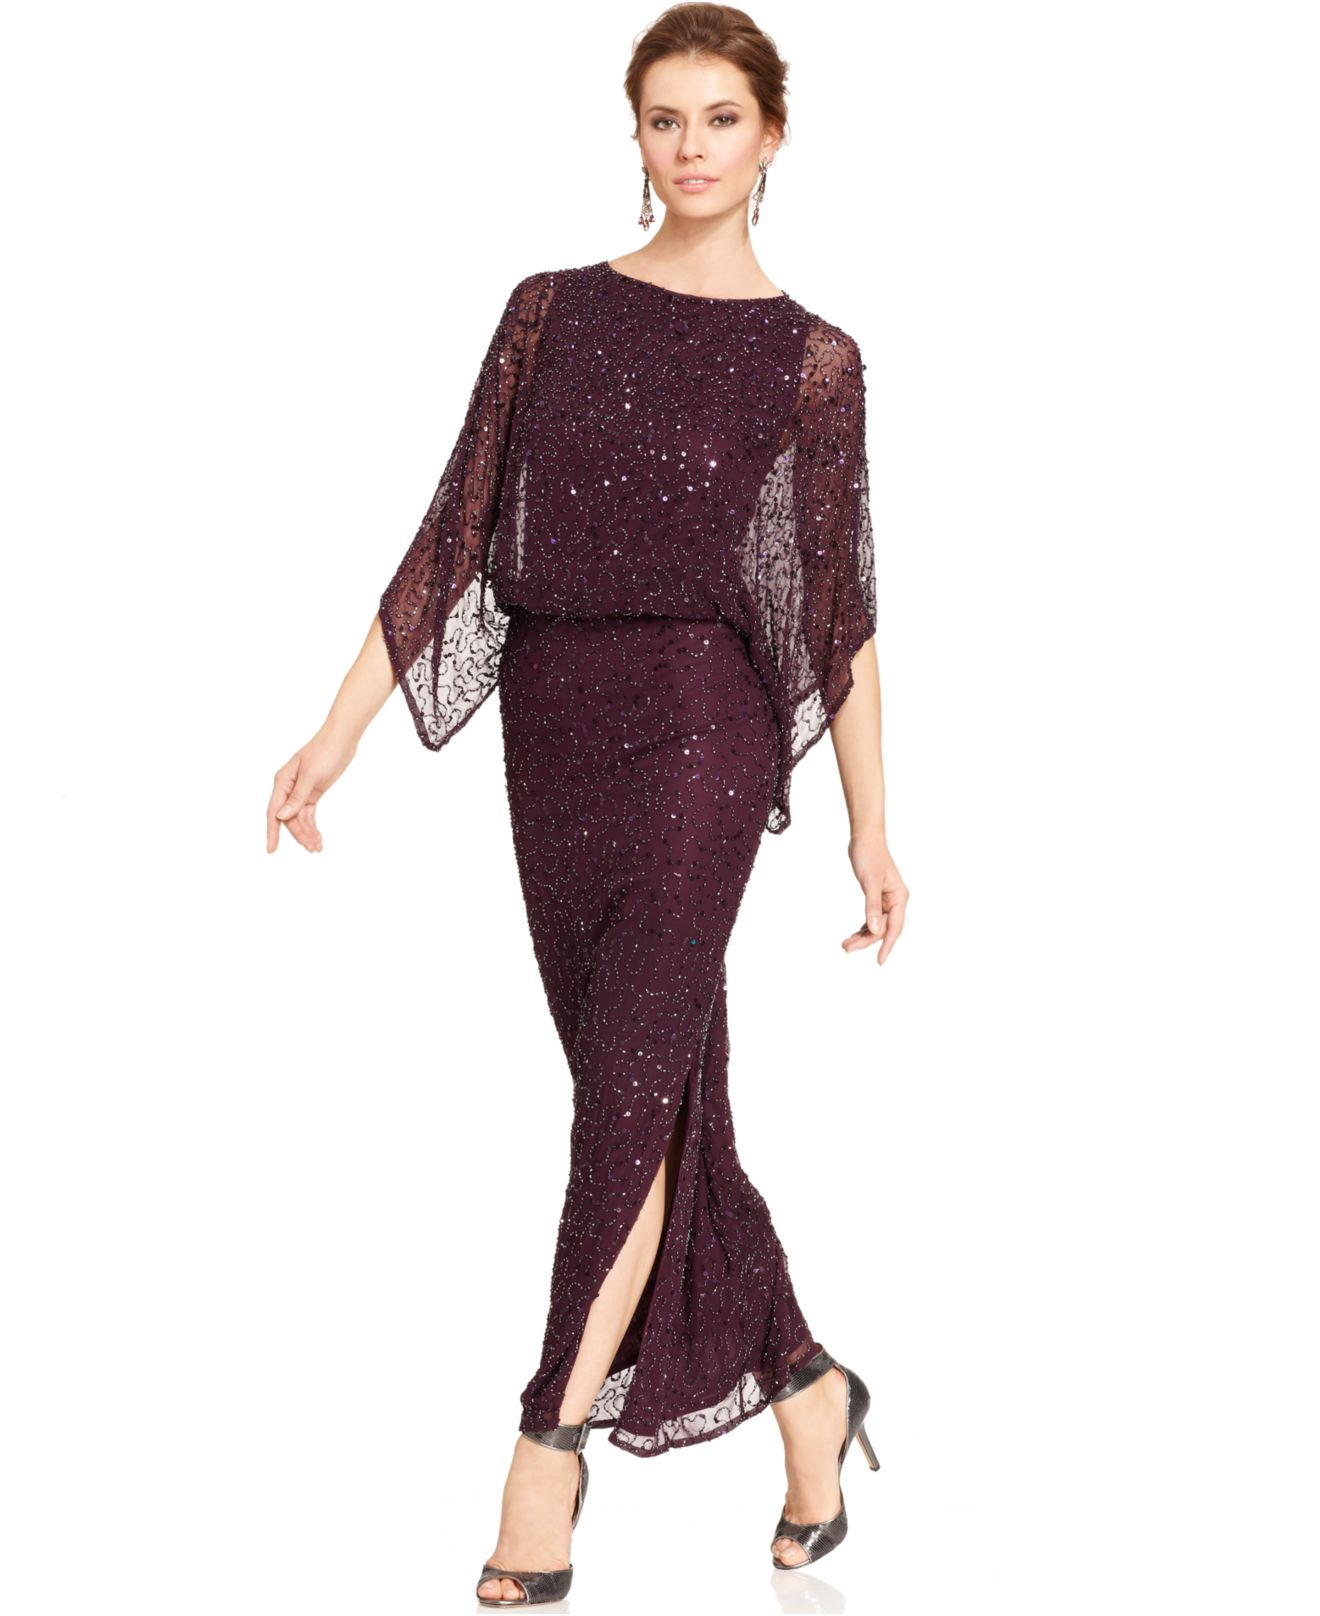 patra plus size evening dresses photo - 1